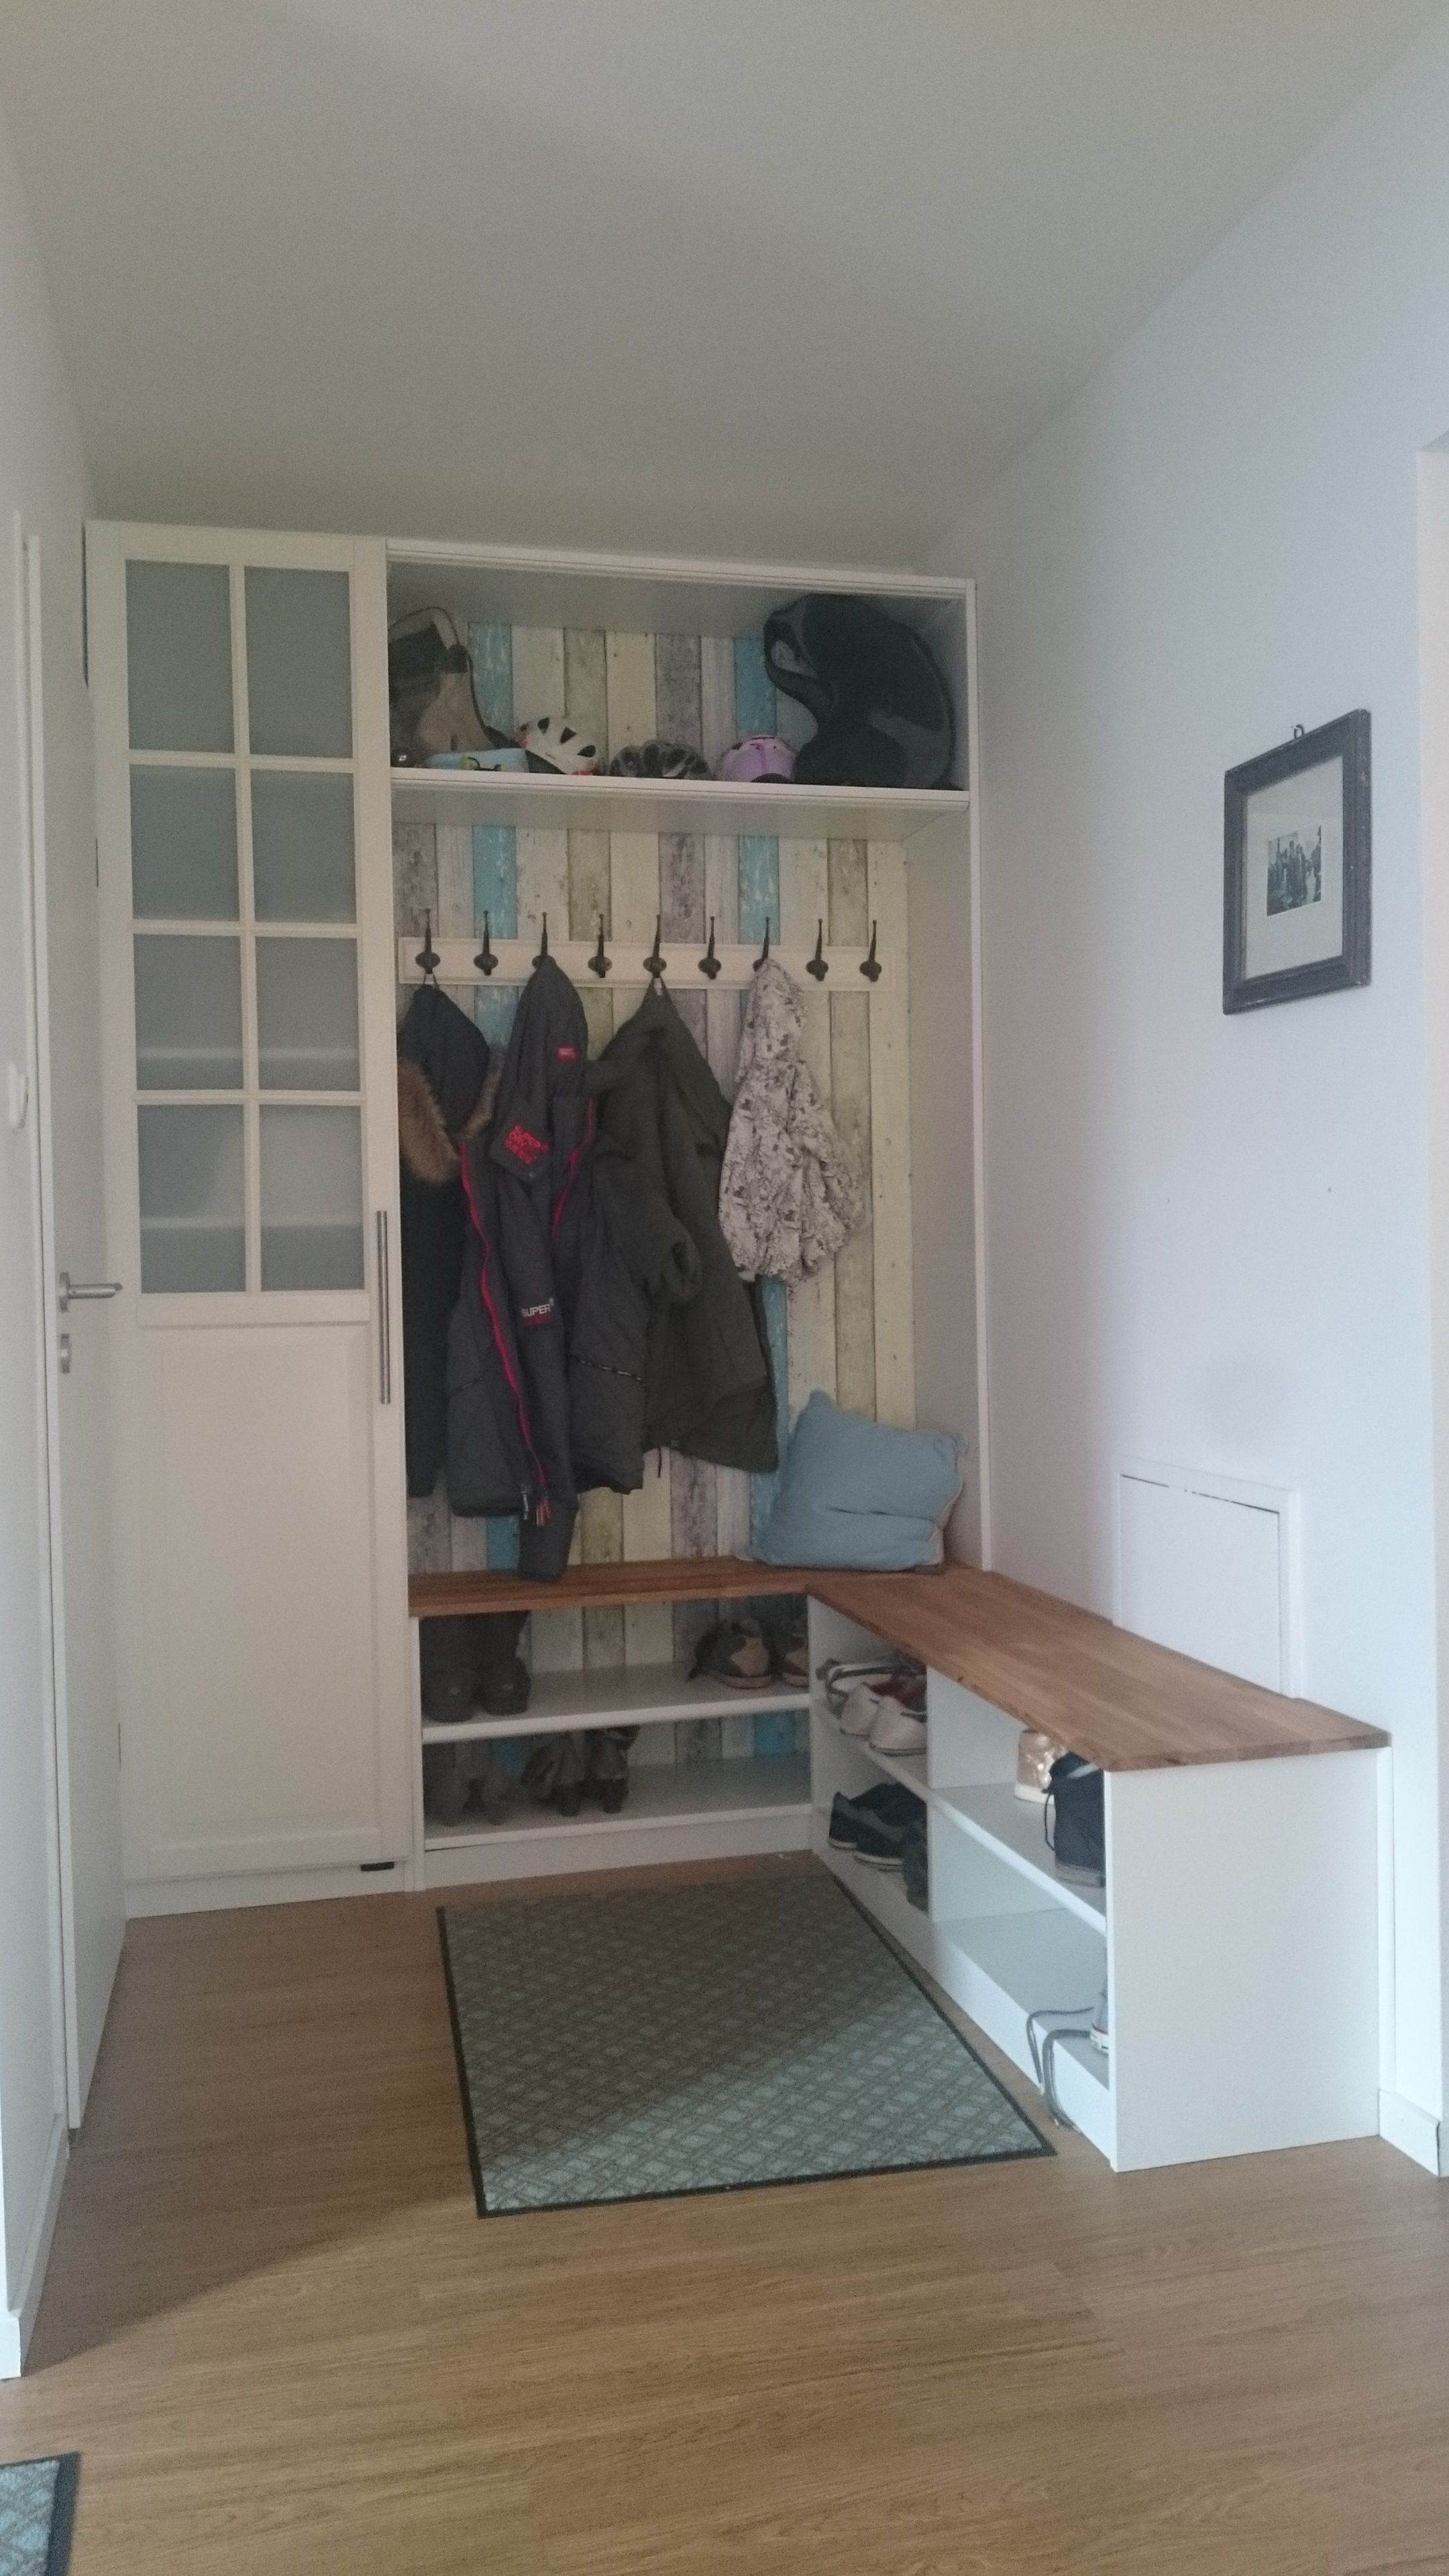 Neue Garderobe Fur Den Flur Bauanleitung Zum Selber Bauen Garderobe Selber Bauen Ikea Ideen Selber Bauen